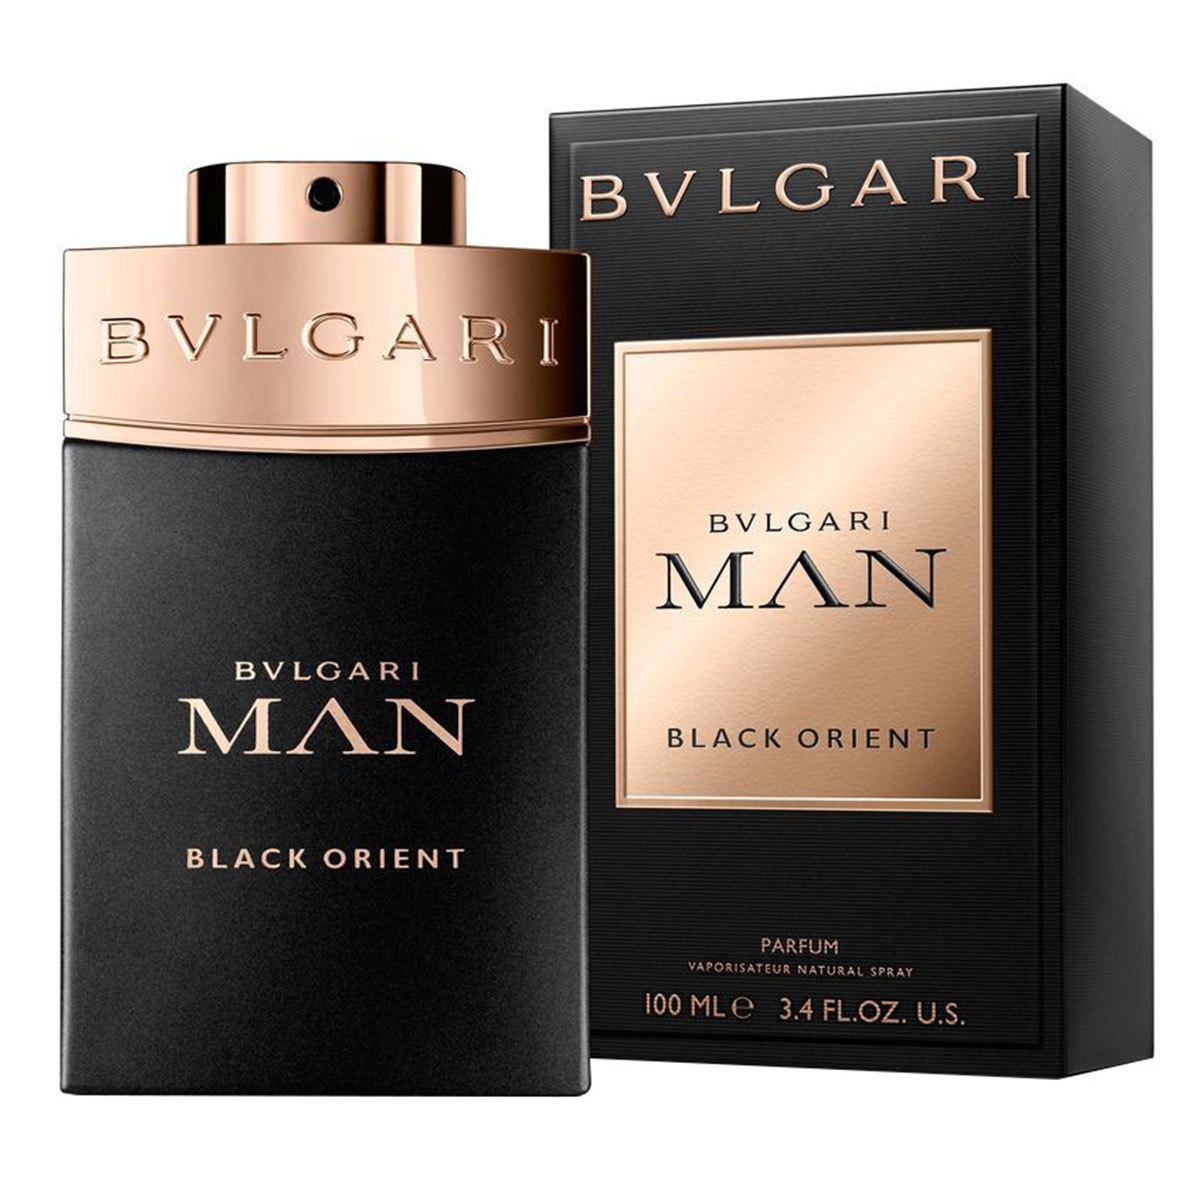 bvlgari man black orient reviews